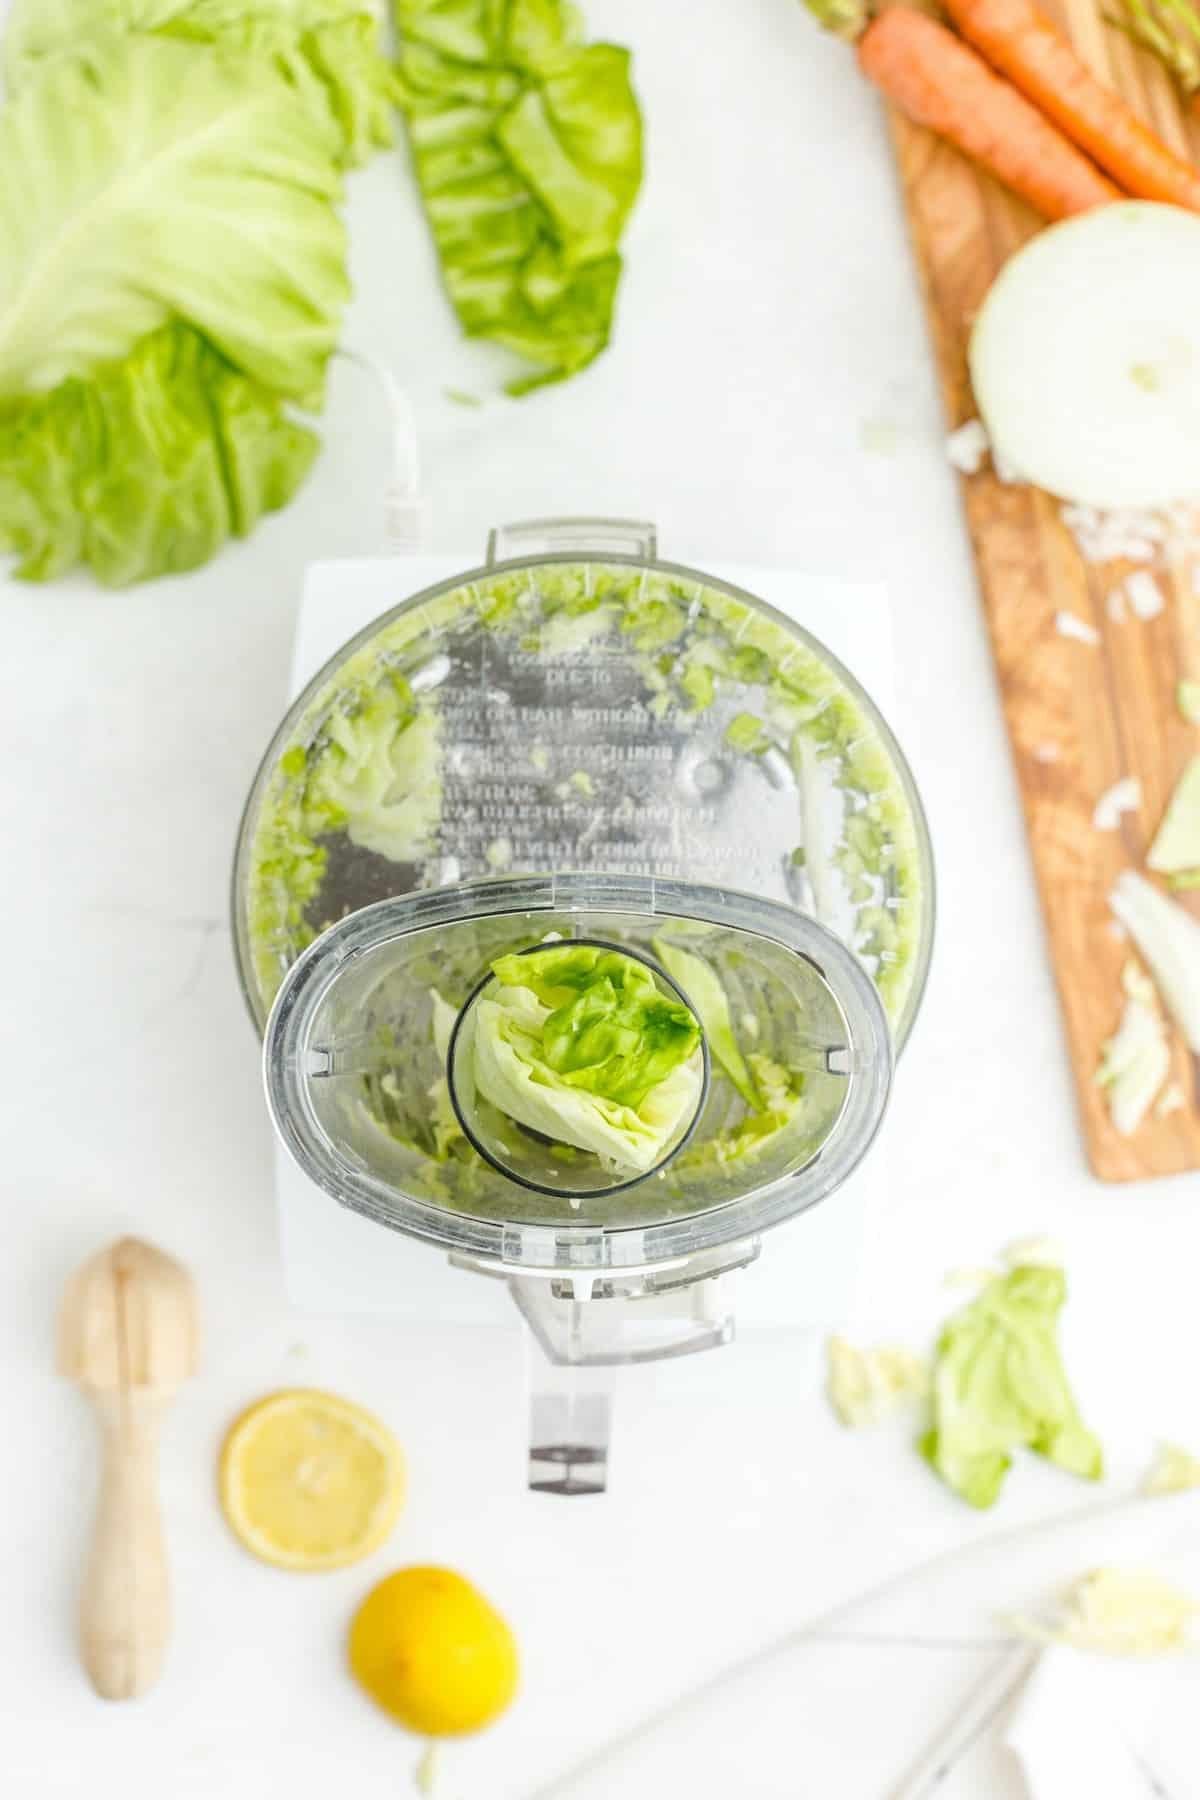 chop cabbage in a food processor